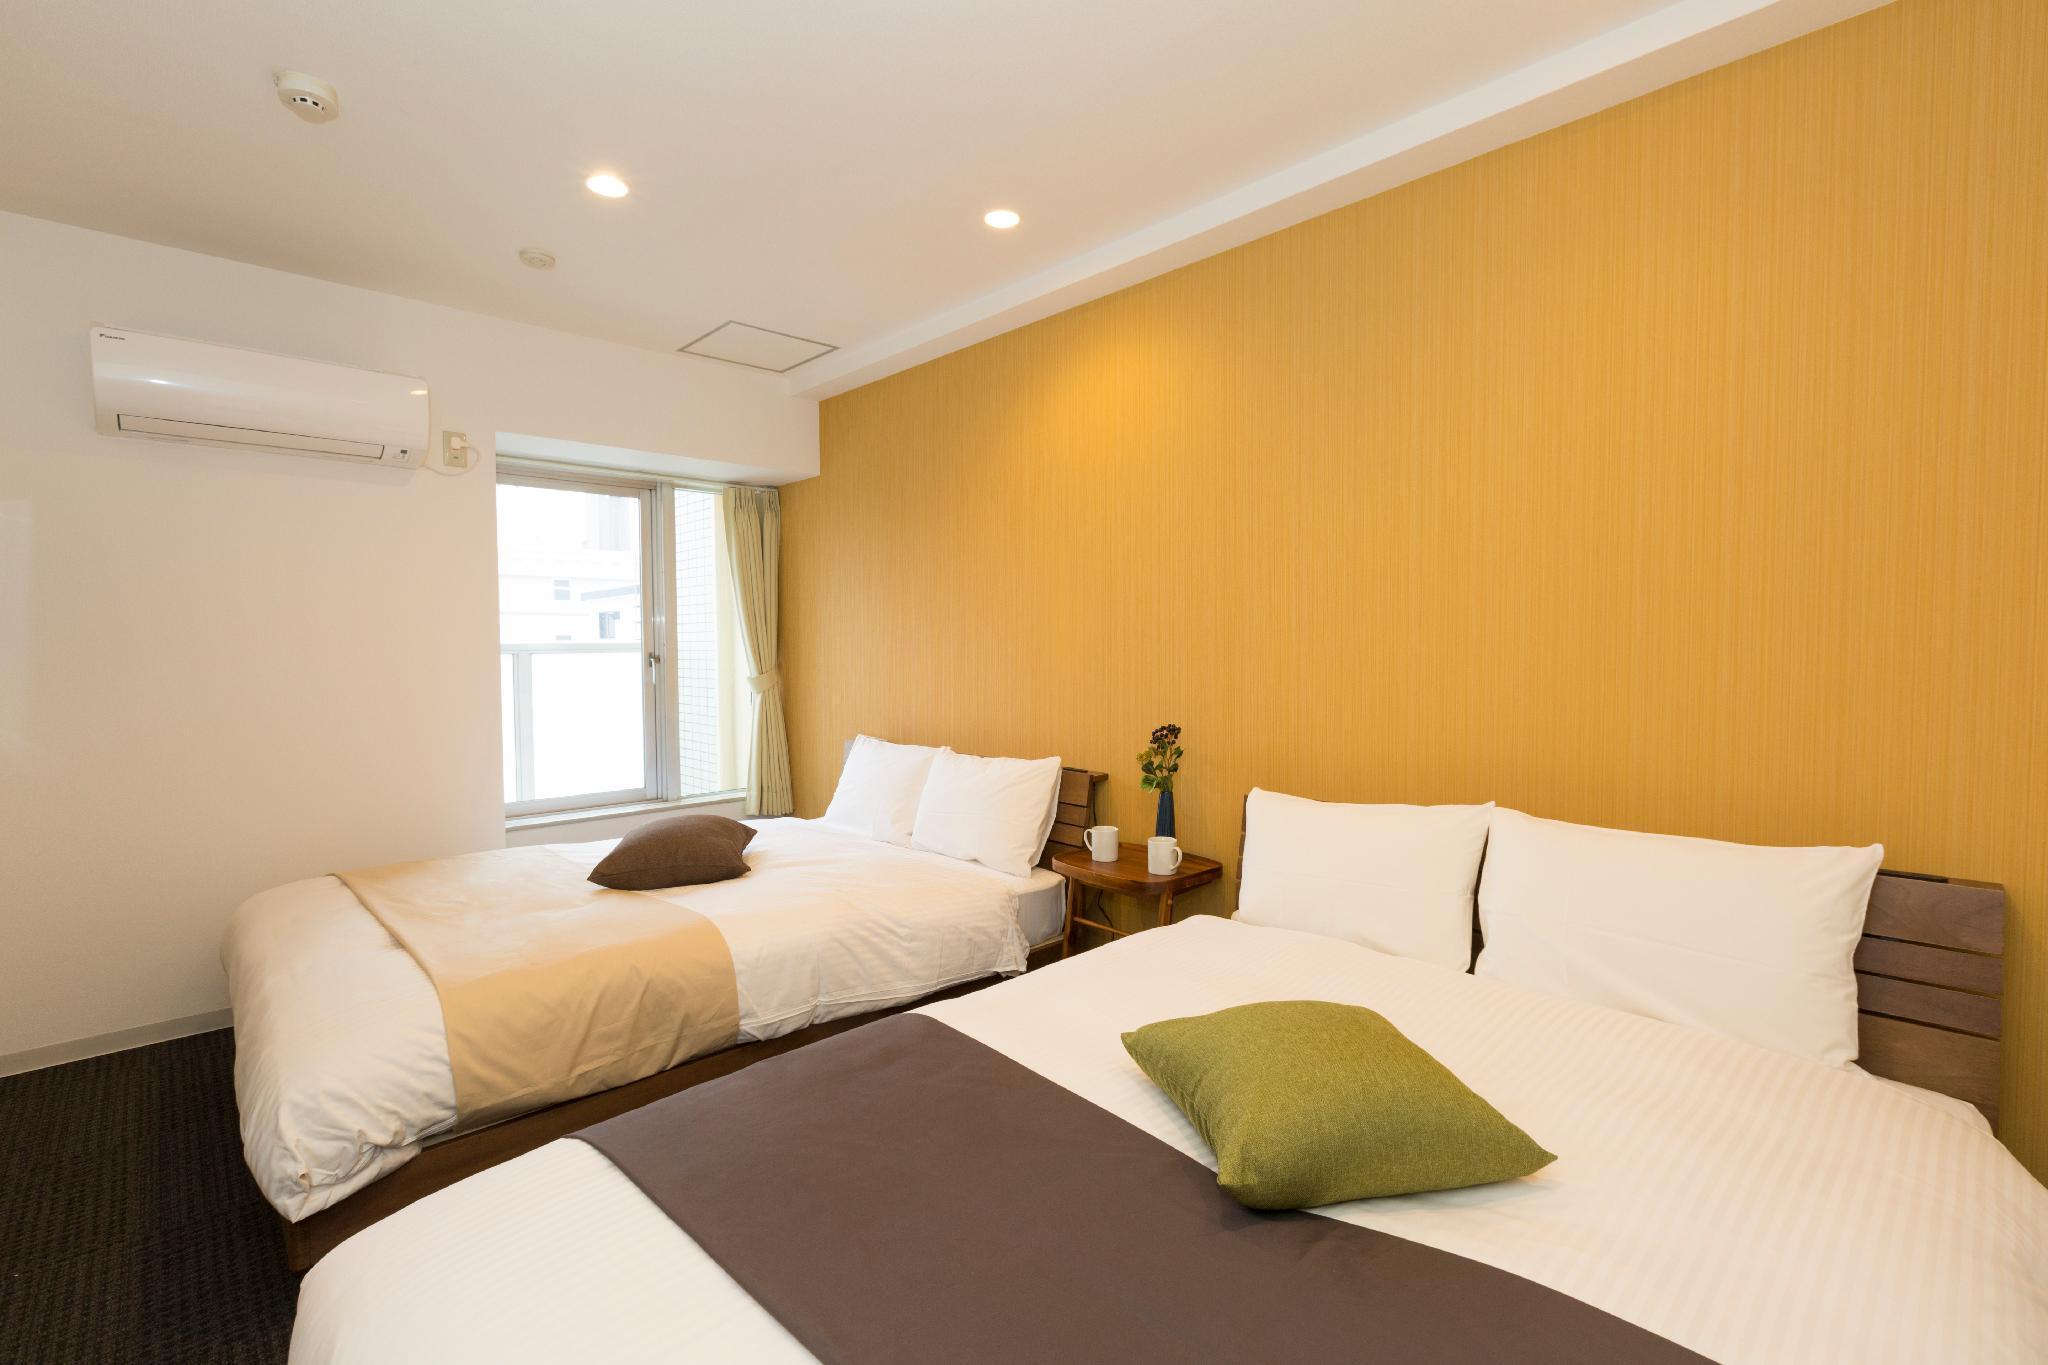 Residence Hotel Stripe Sapporo, Sapporo